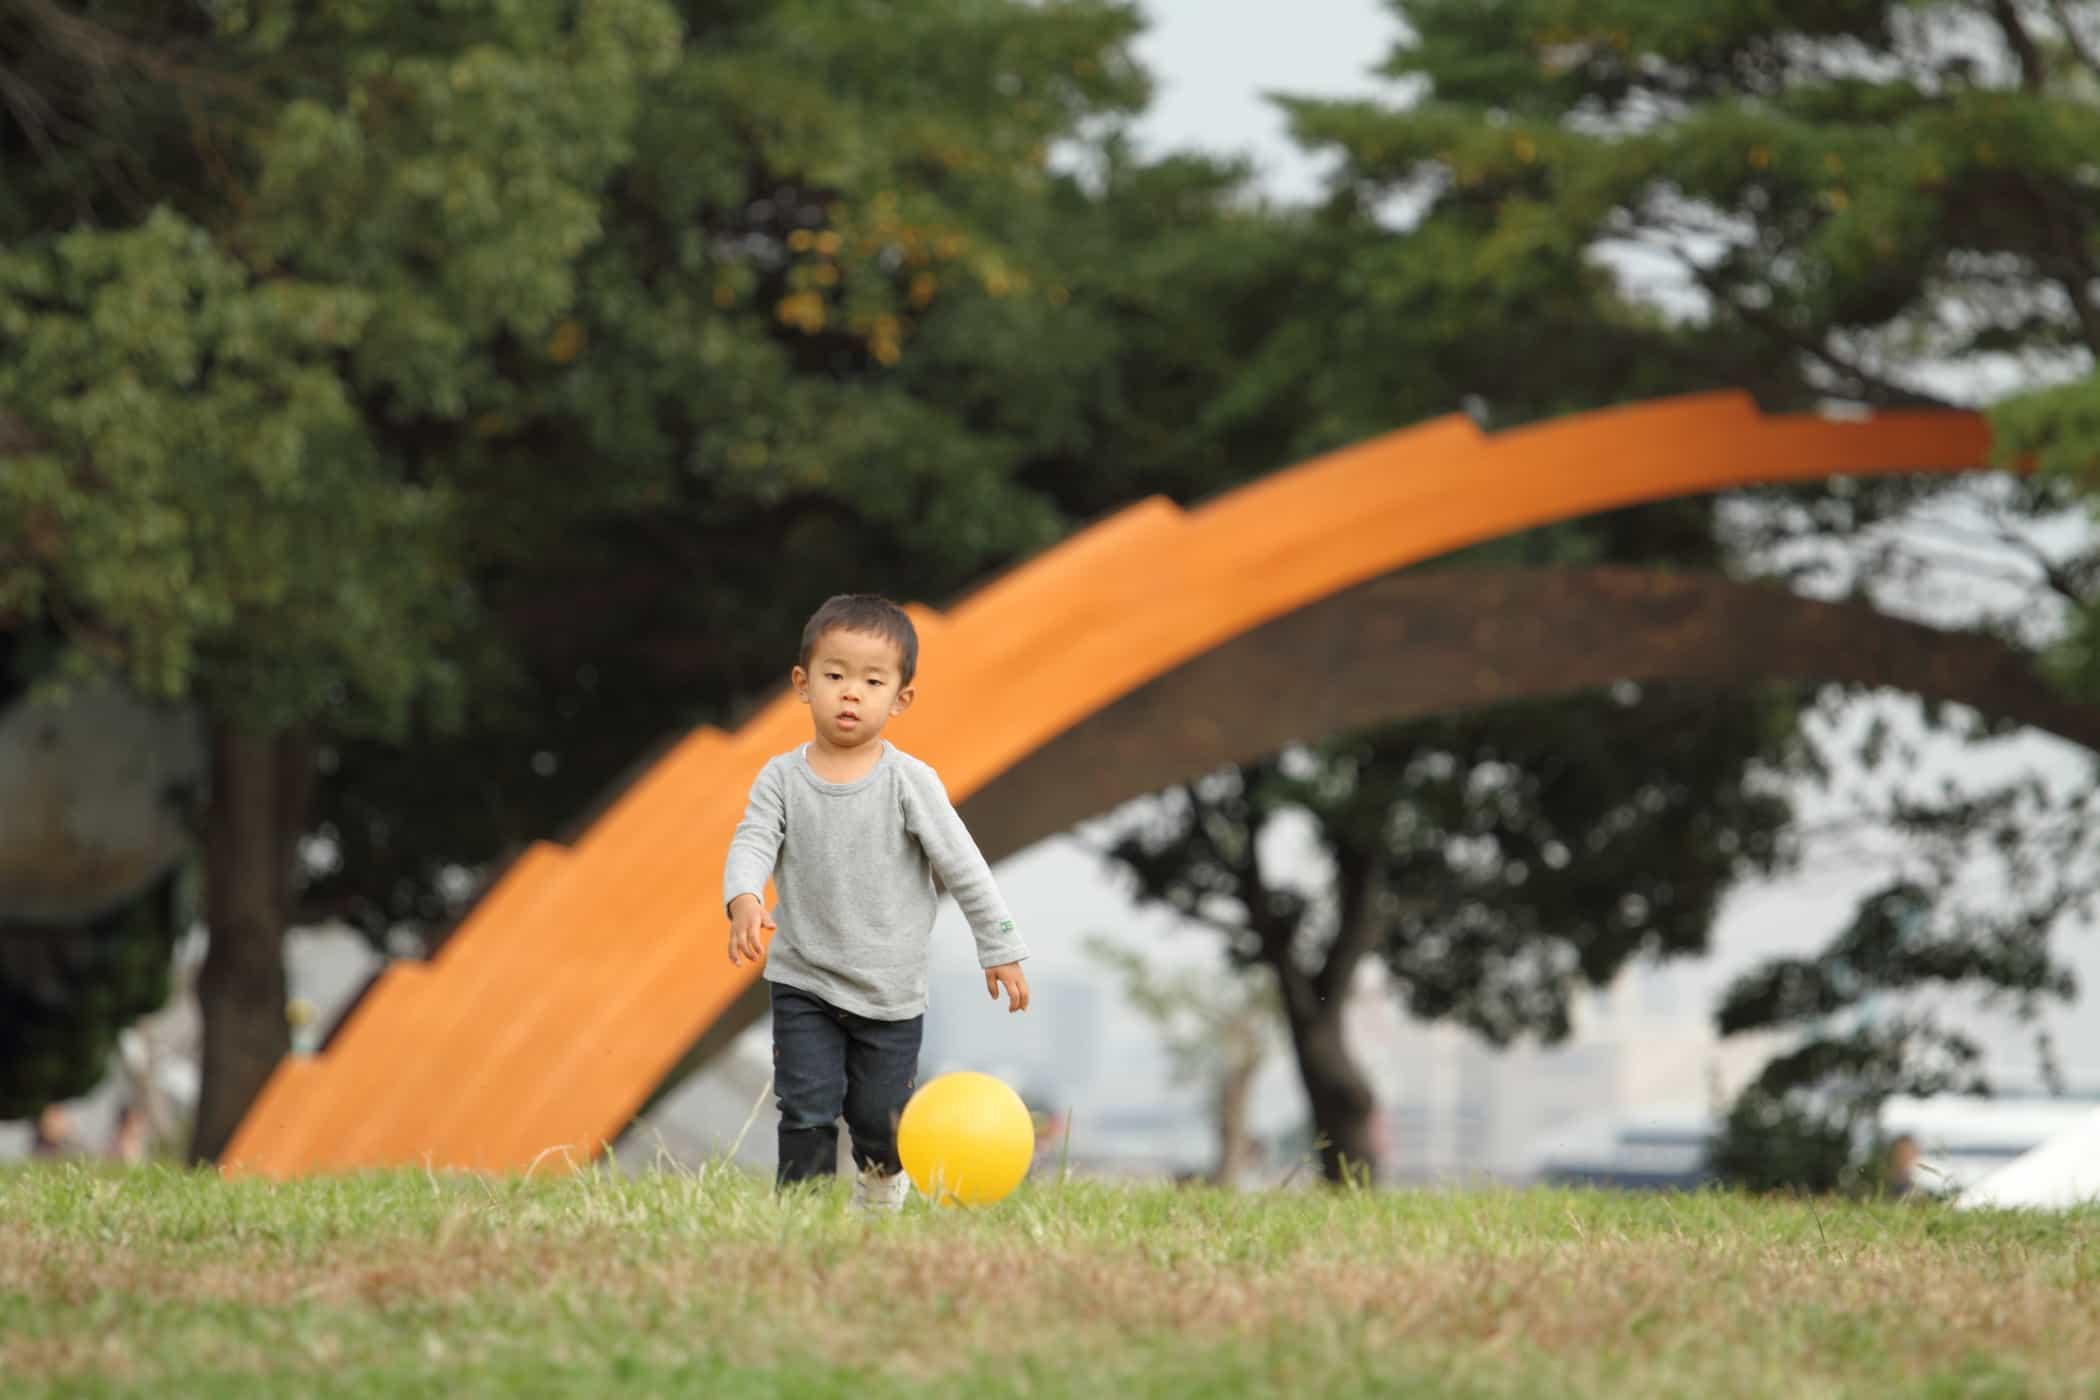 Manfaat olahraga anak